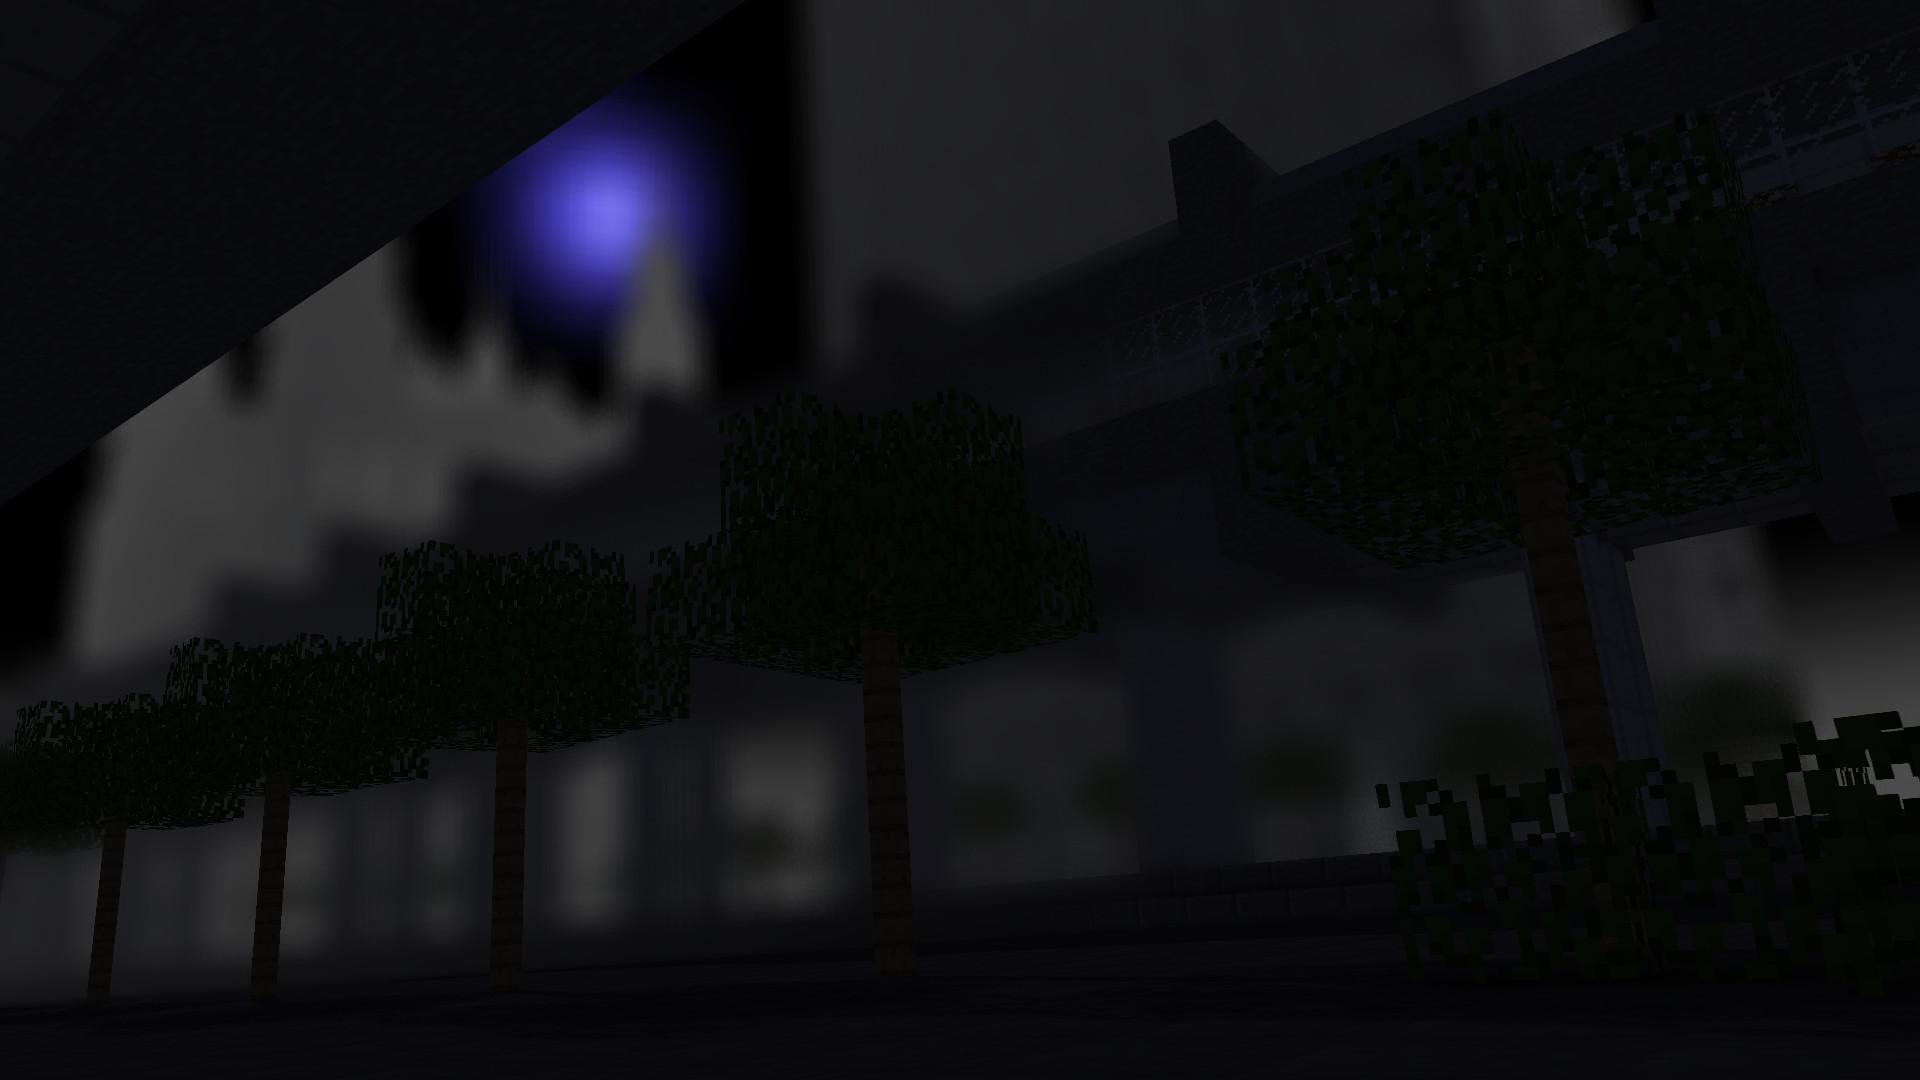 Amazing Wallpaper Minecraft Night - 505319  Image_771192.jpg